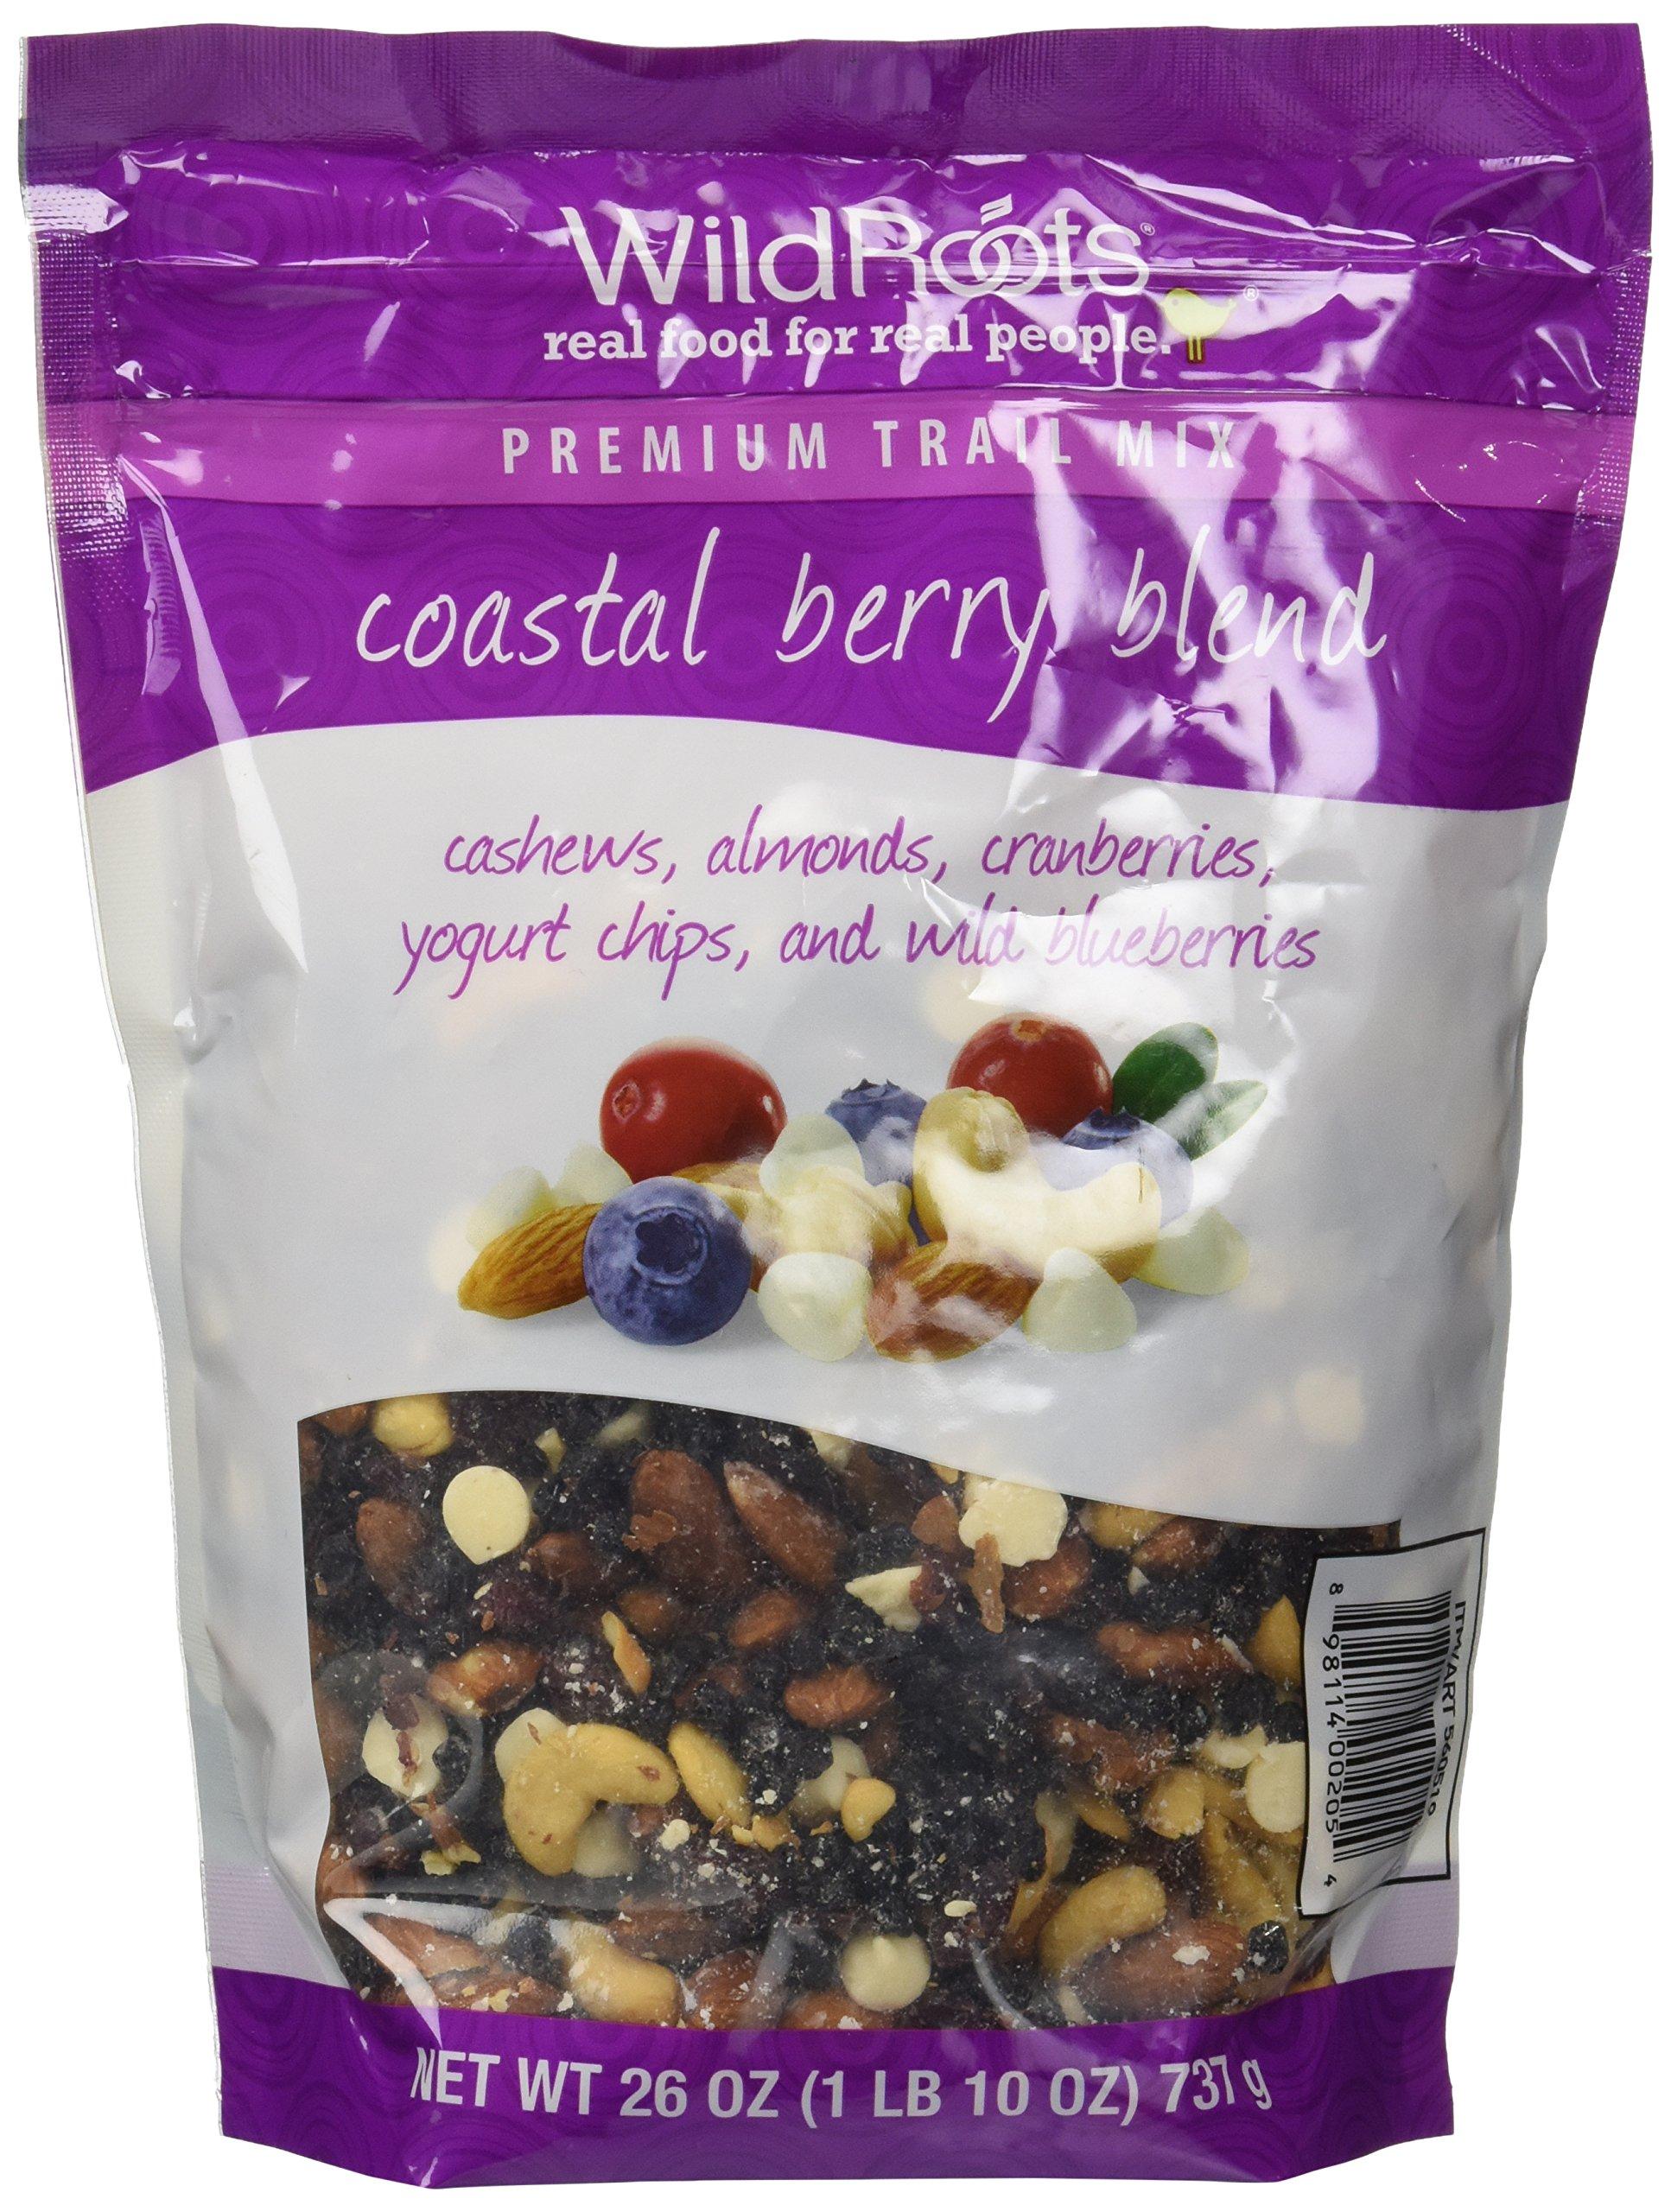 Wild Roots 100% Natural Trail Mix Coastal Berry Blend (26 oz)